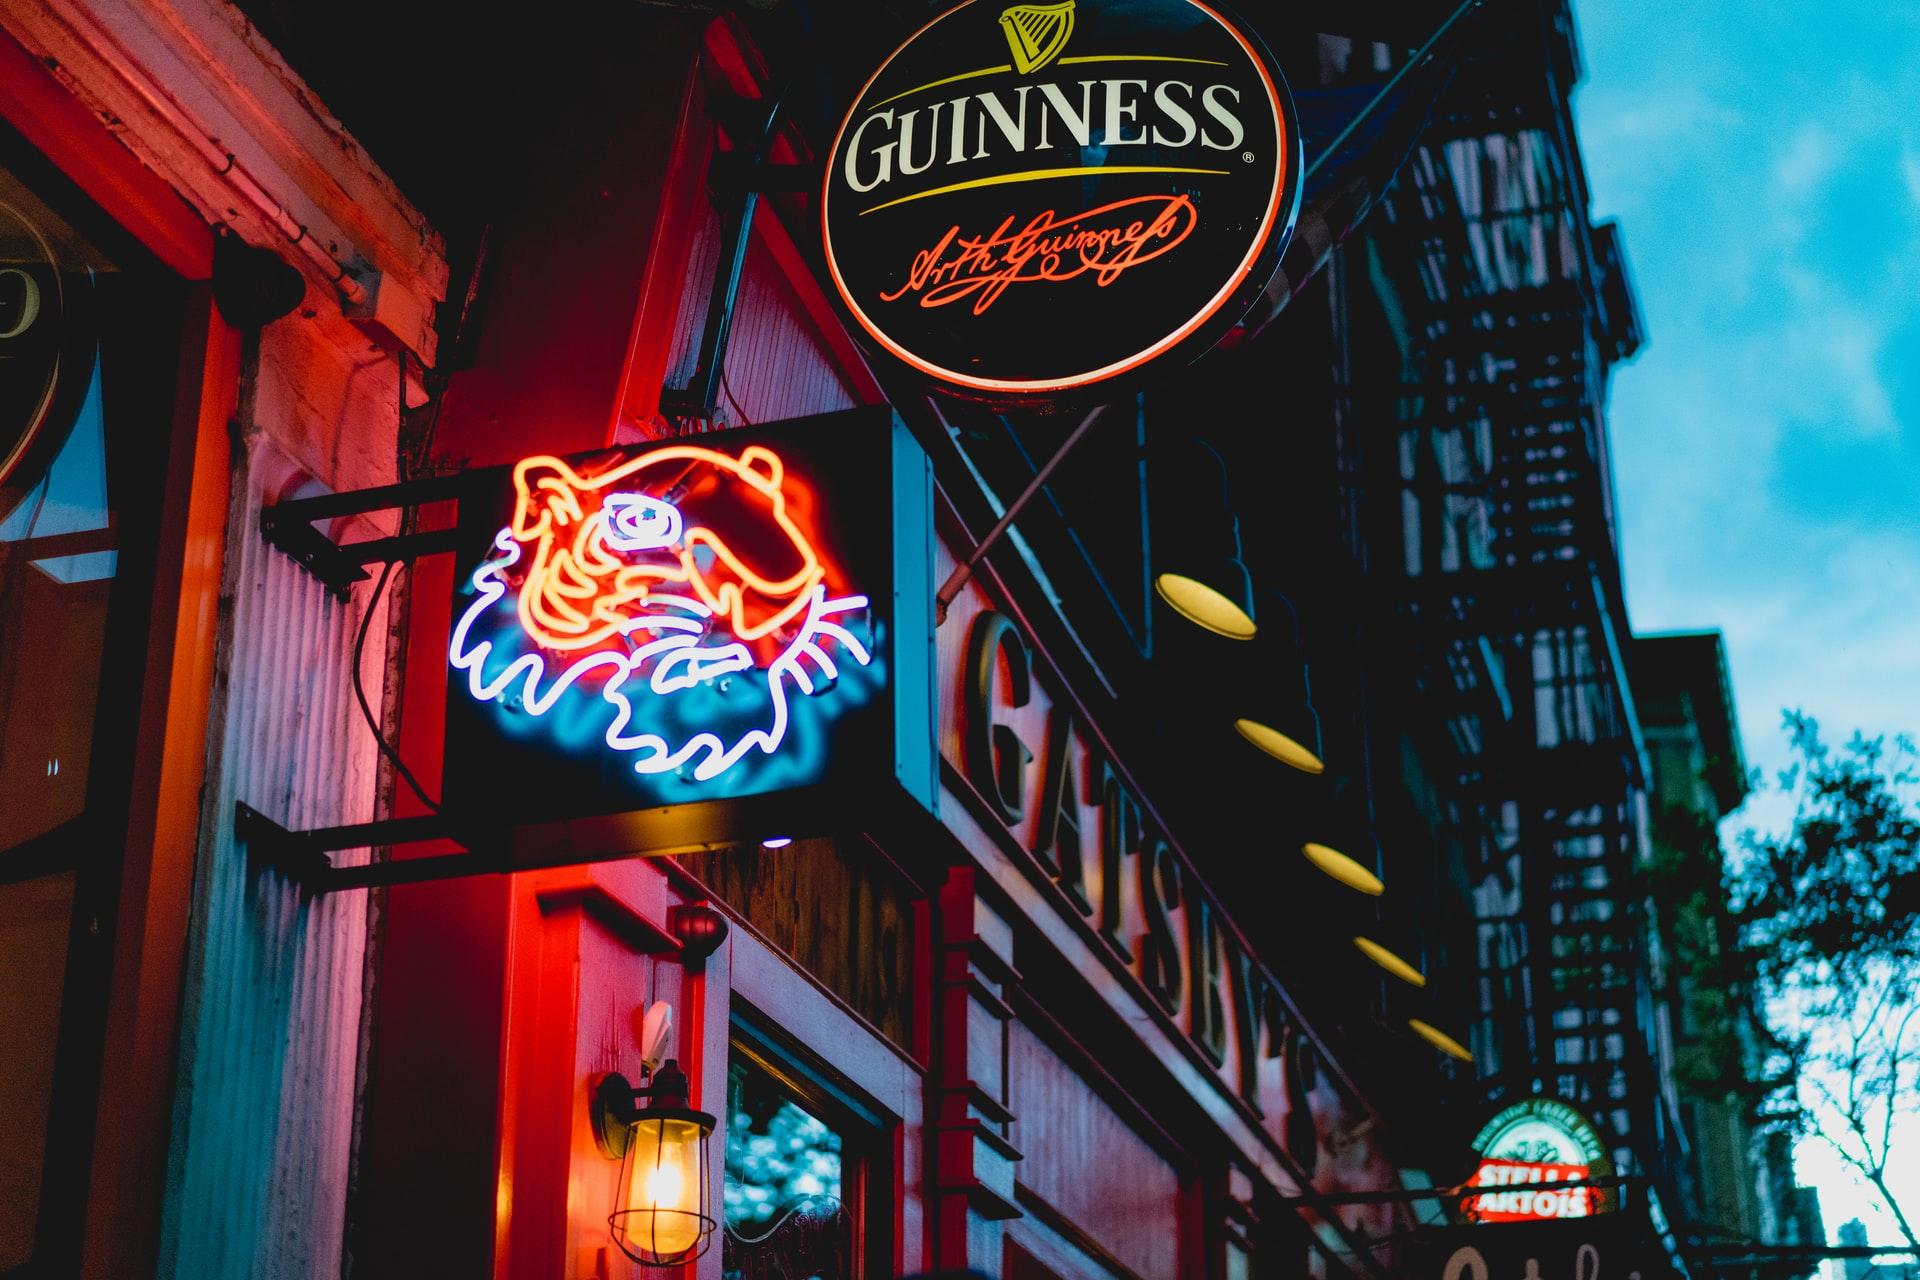 Authentic Irish Eateries